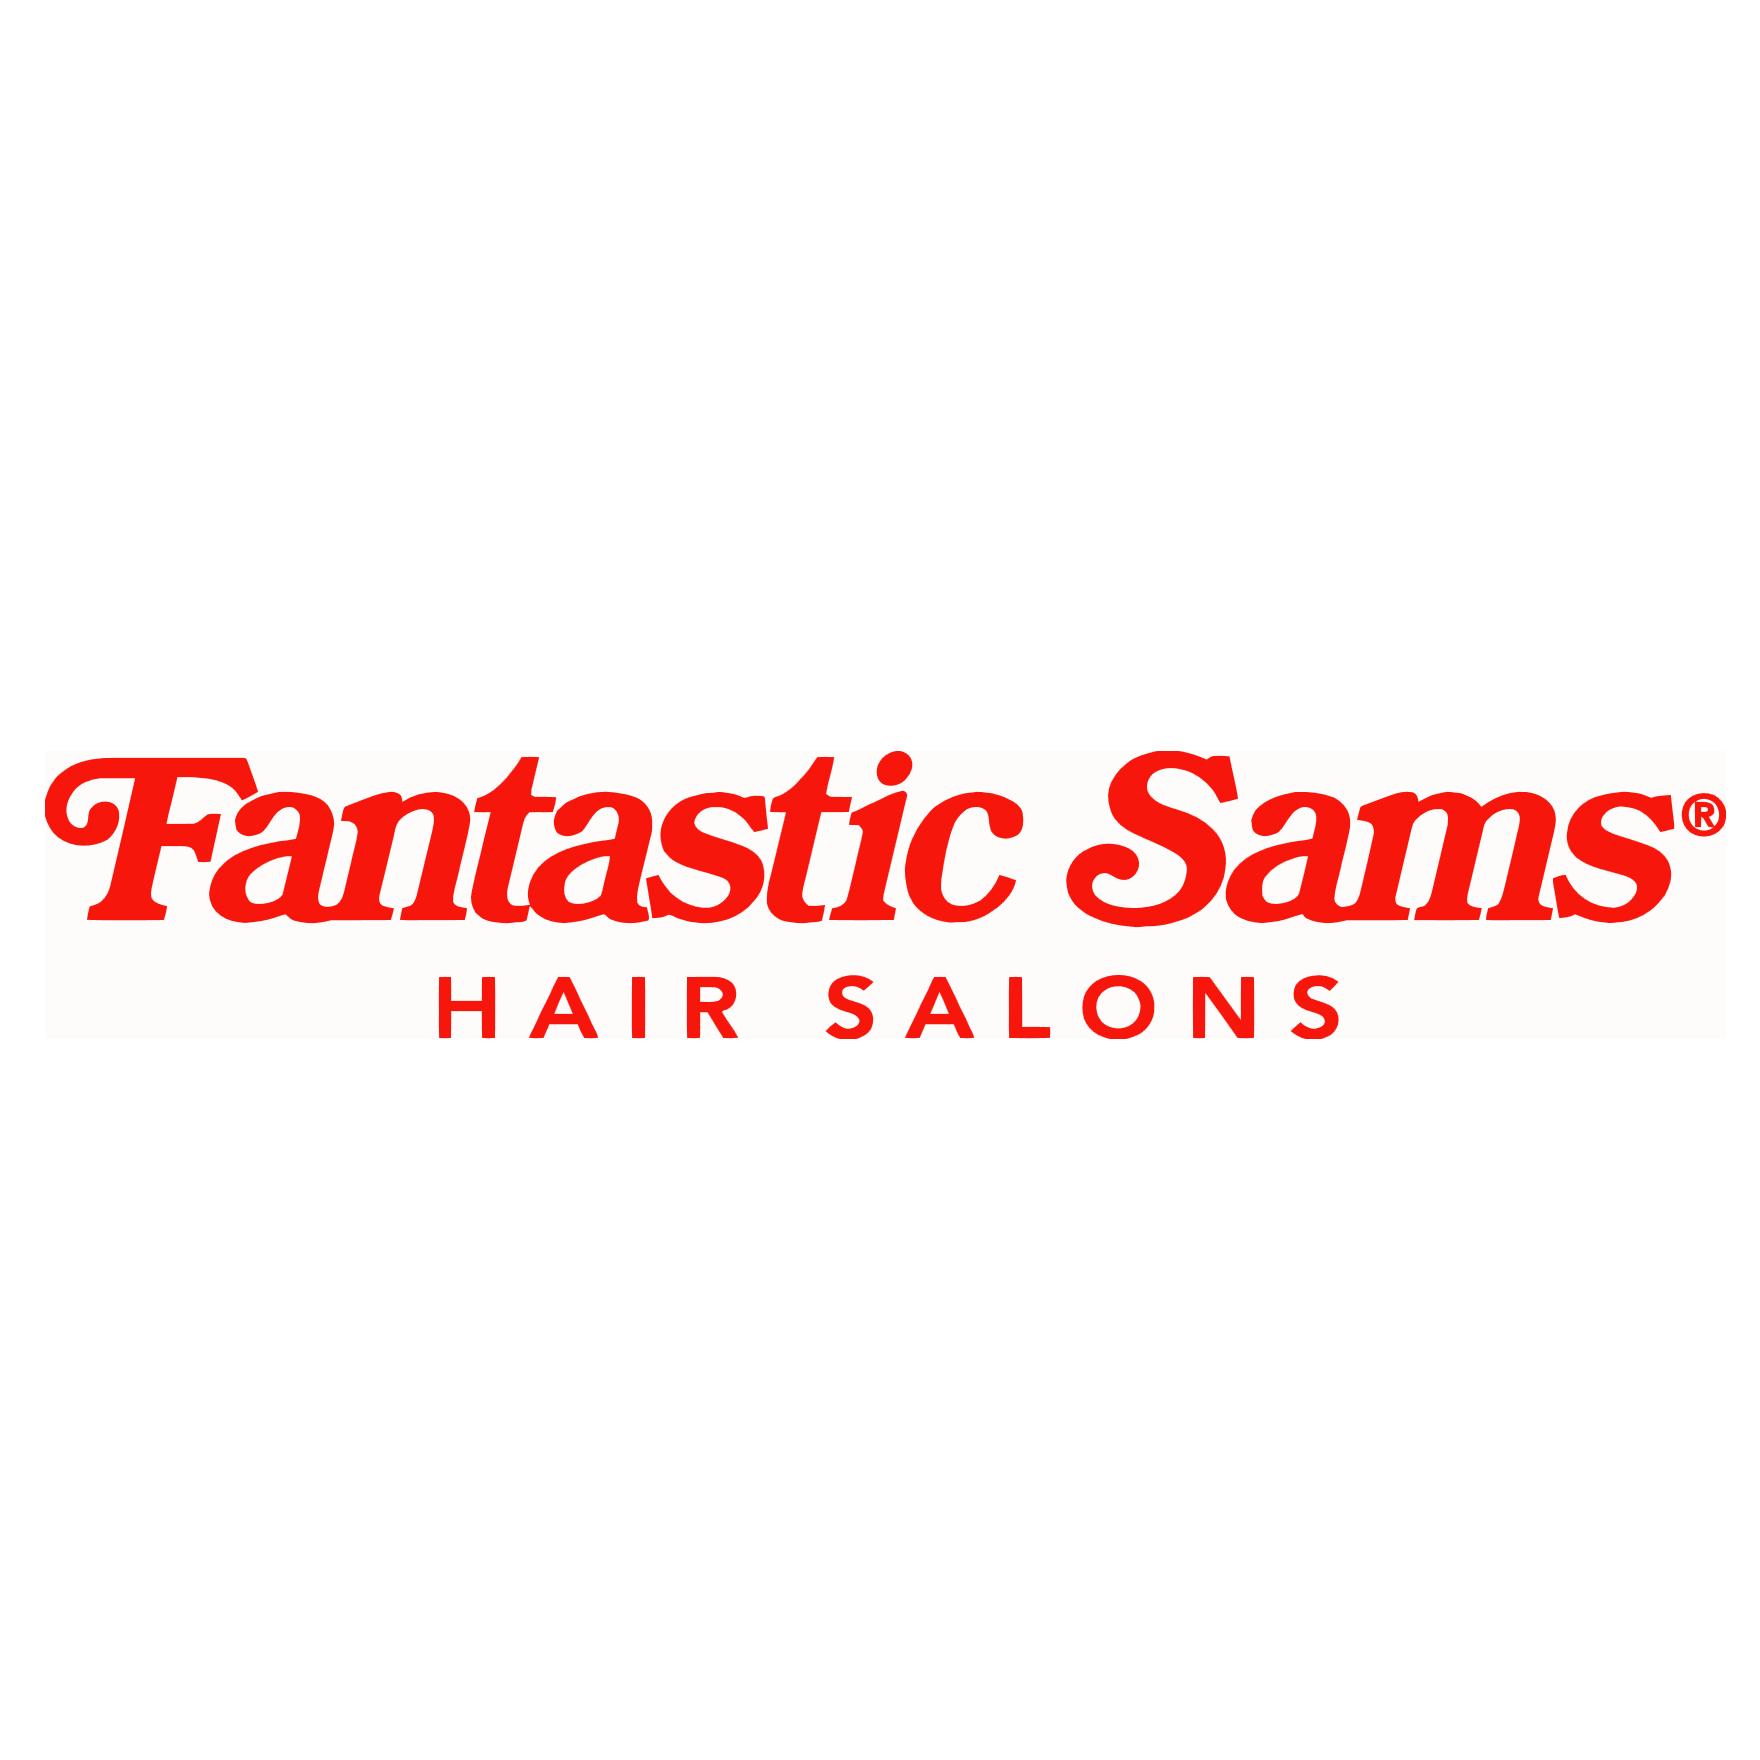 Fantastic sams hair salon in plano tx 75075 for Sams salon